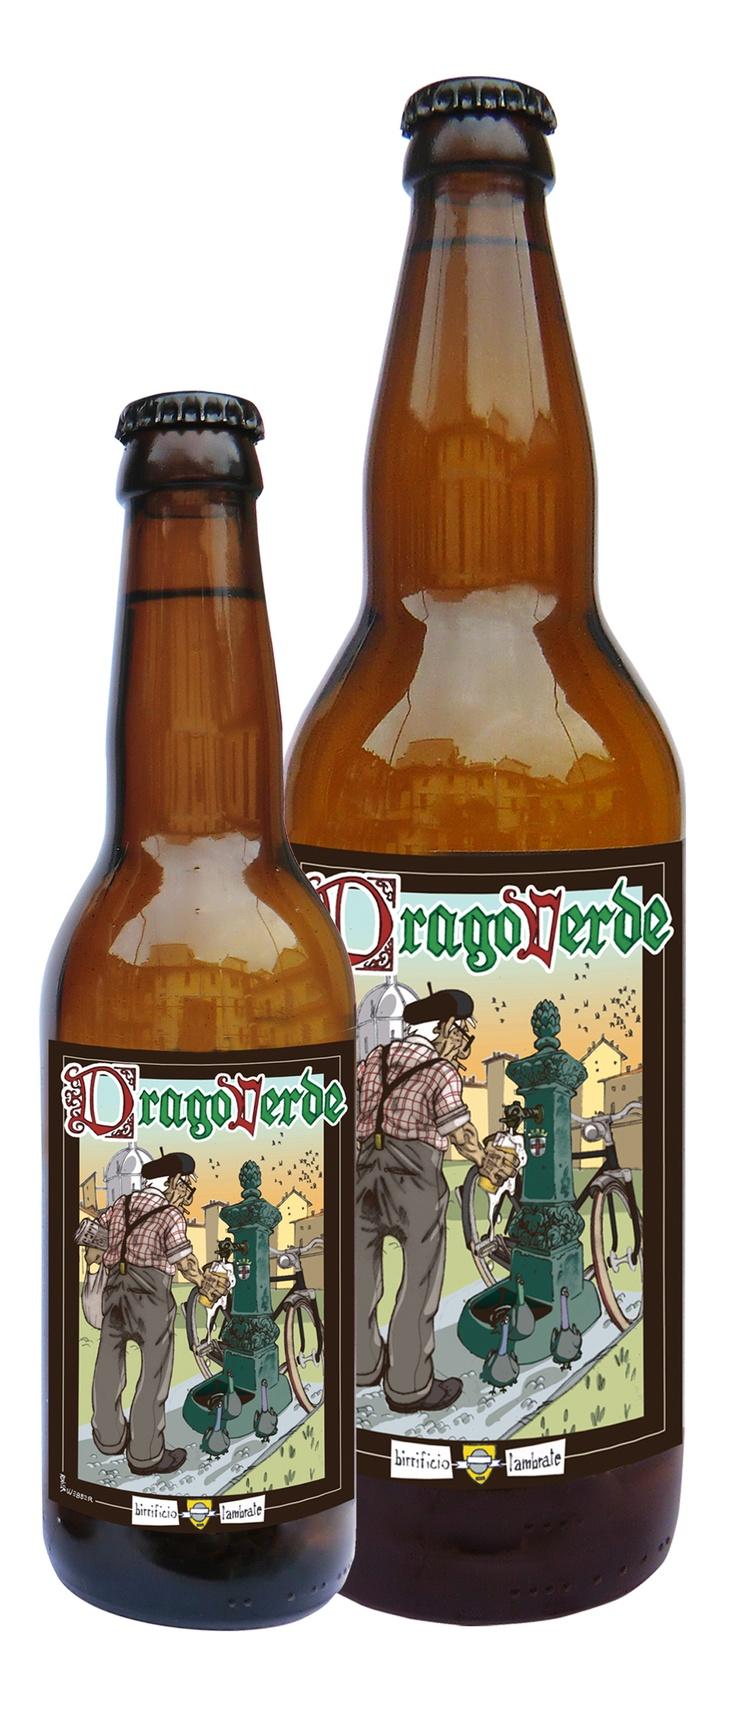 DRAGO VERDE  Vol. 4 %   Birra in stile American Lager, rinfrescante con note agrumate